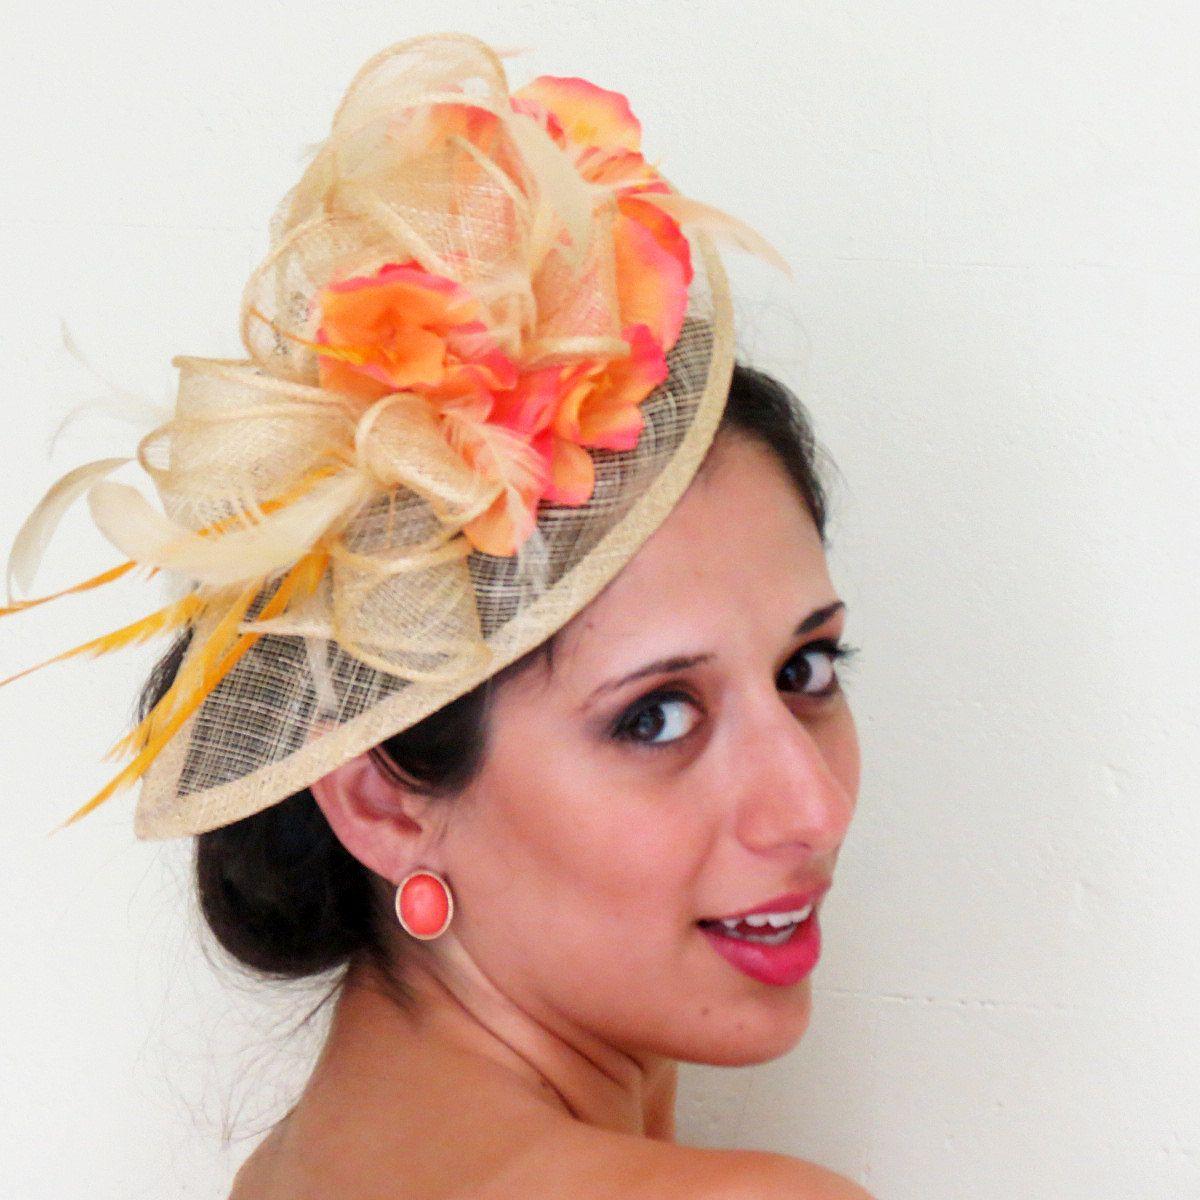 7611269fd2352 Black-Eyed Susan   Preakness - Fascinator peach salmon and orange natural  by FascinatorsFirst